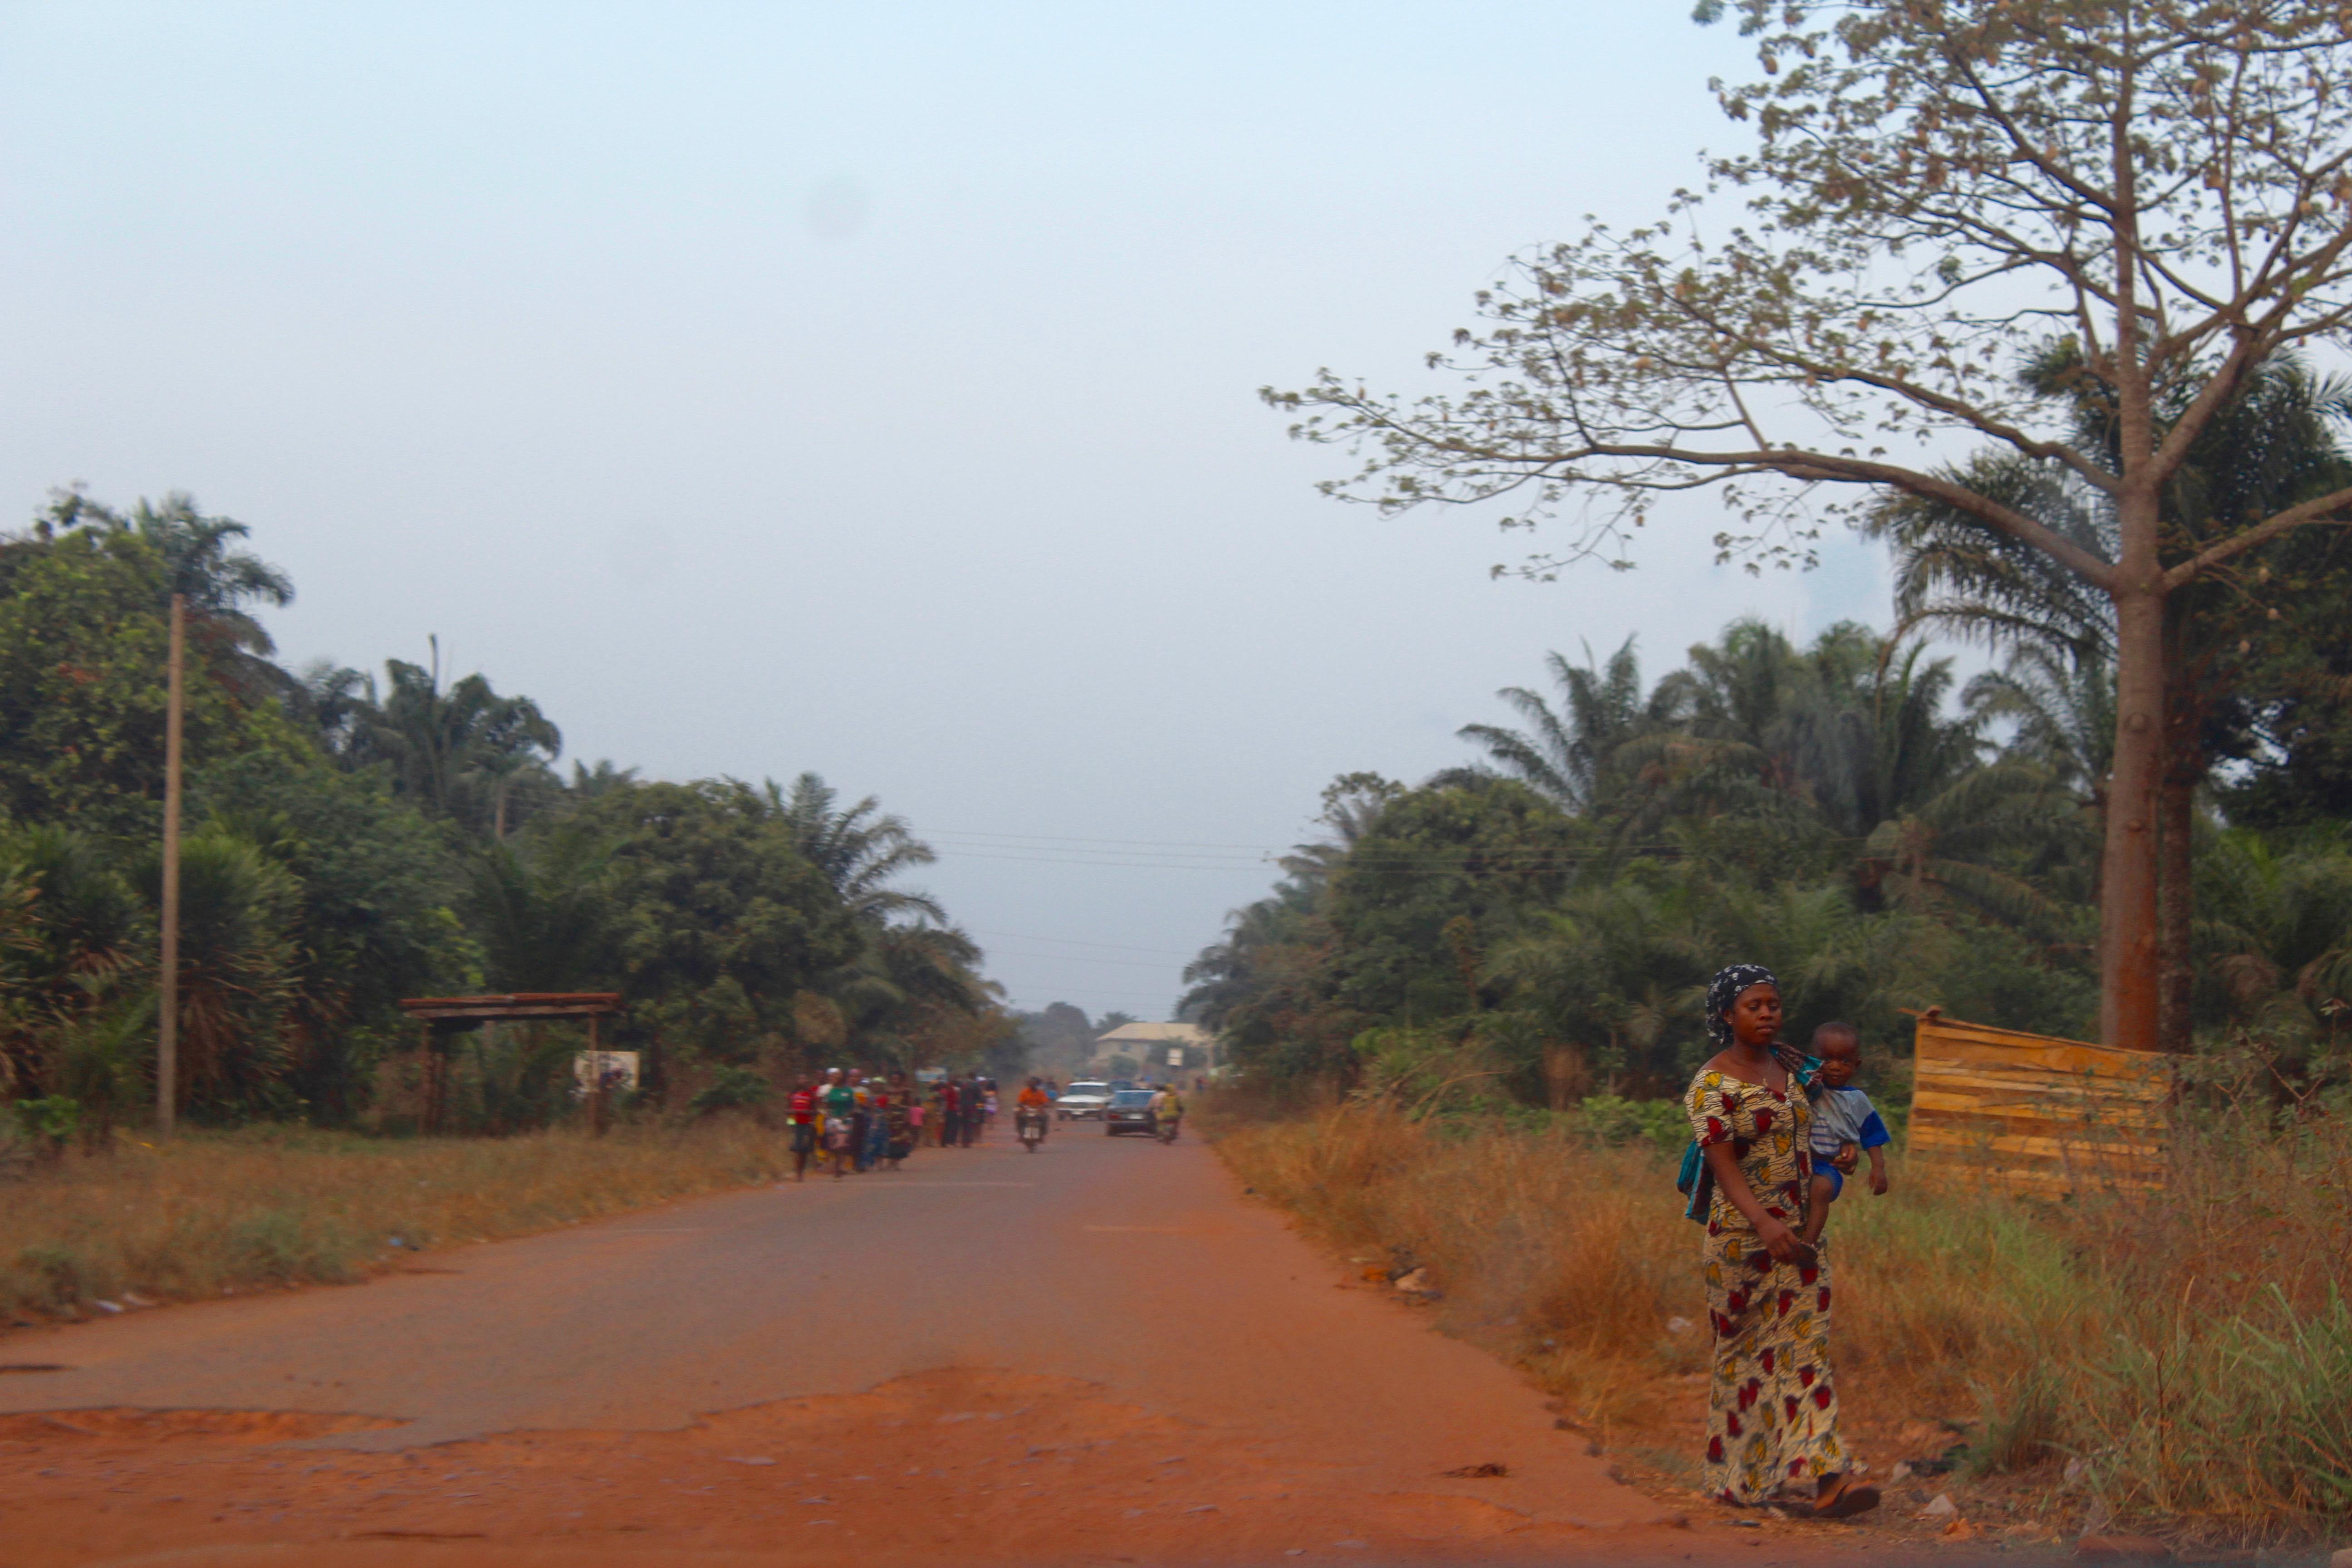 Obollo-Afor, Enugu, Nigeria. #JujuFilms